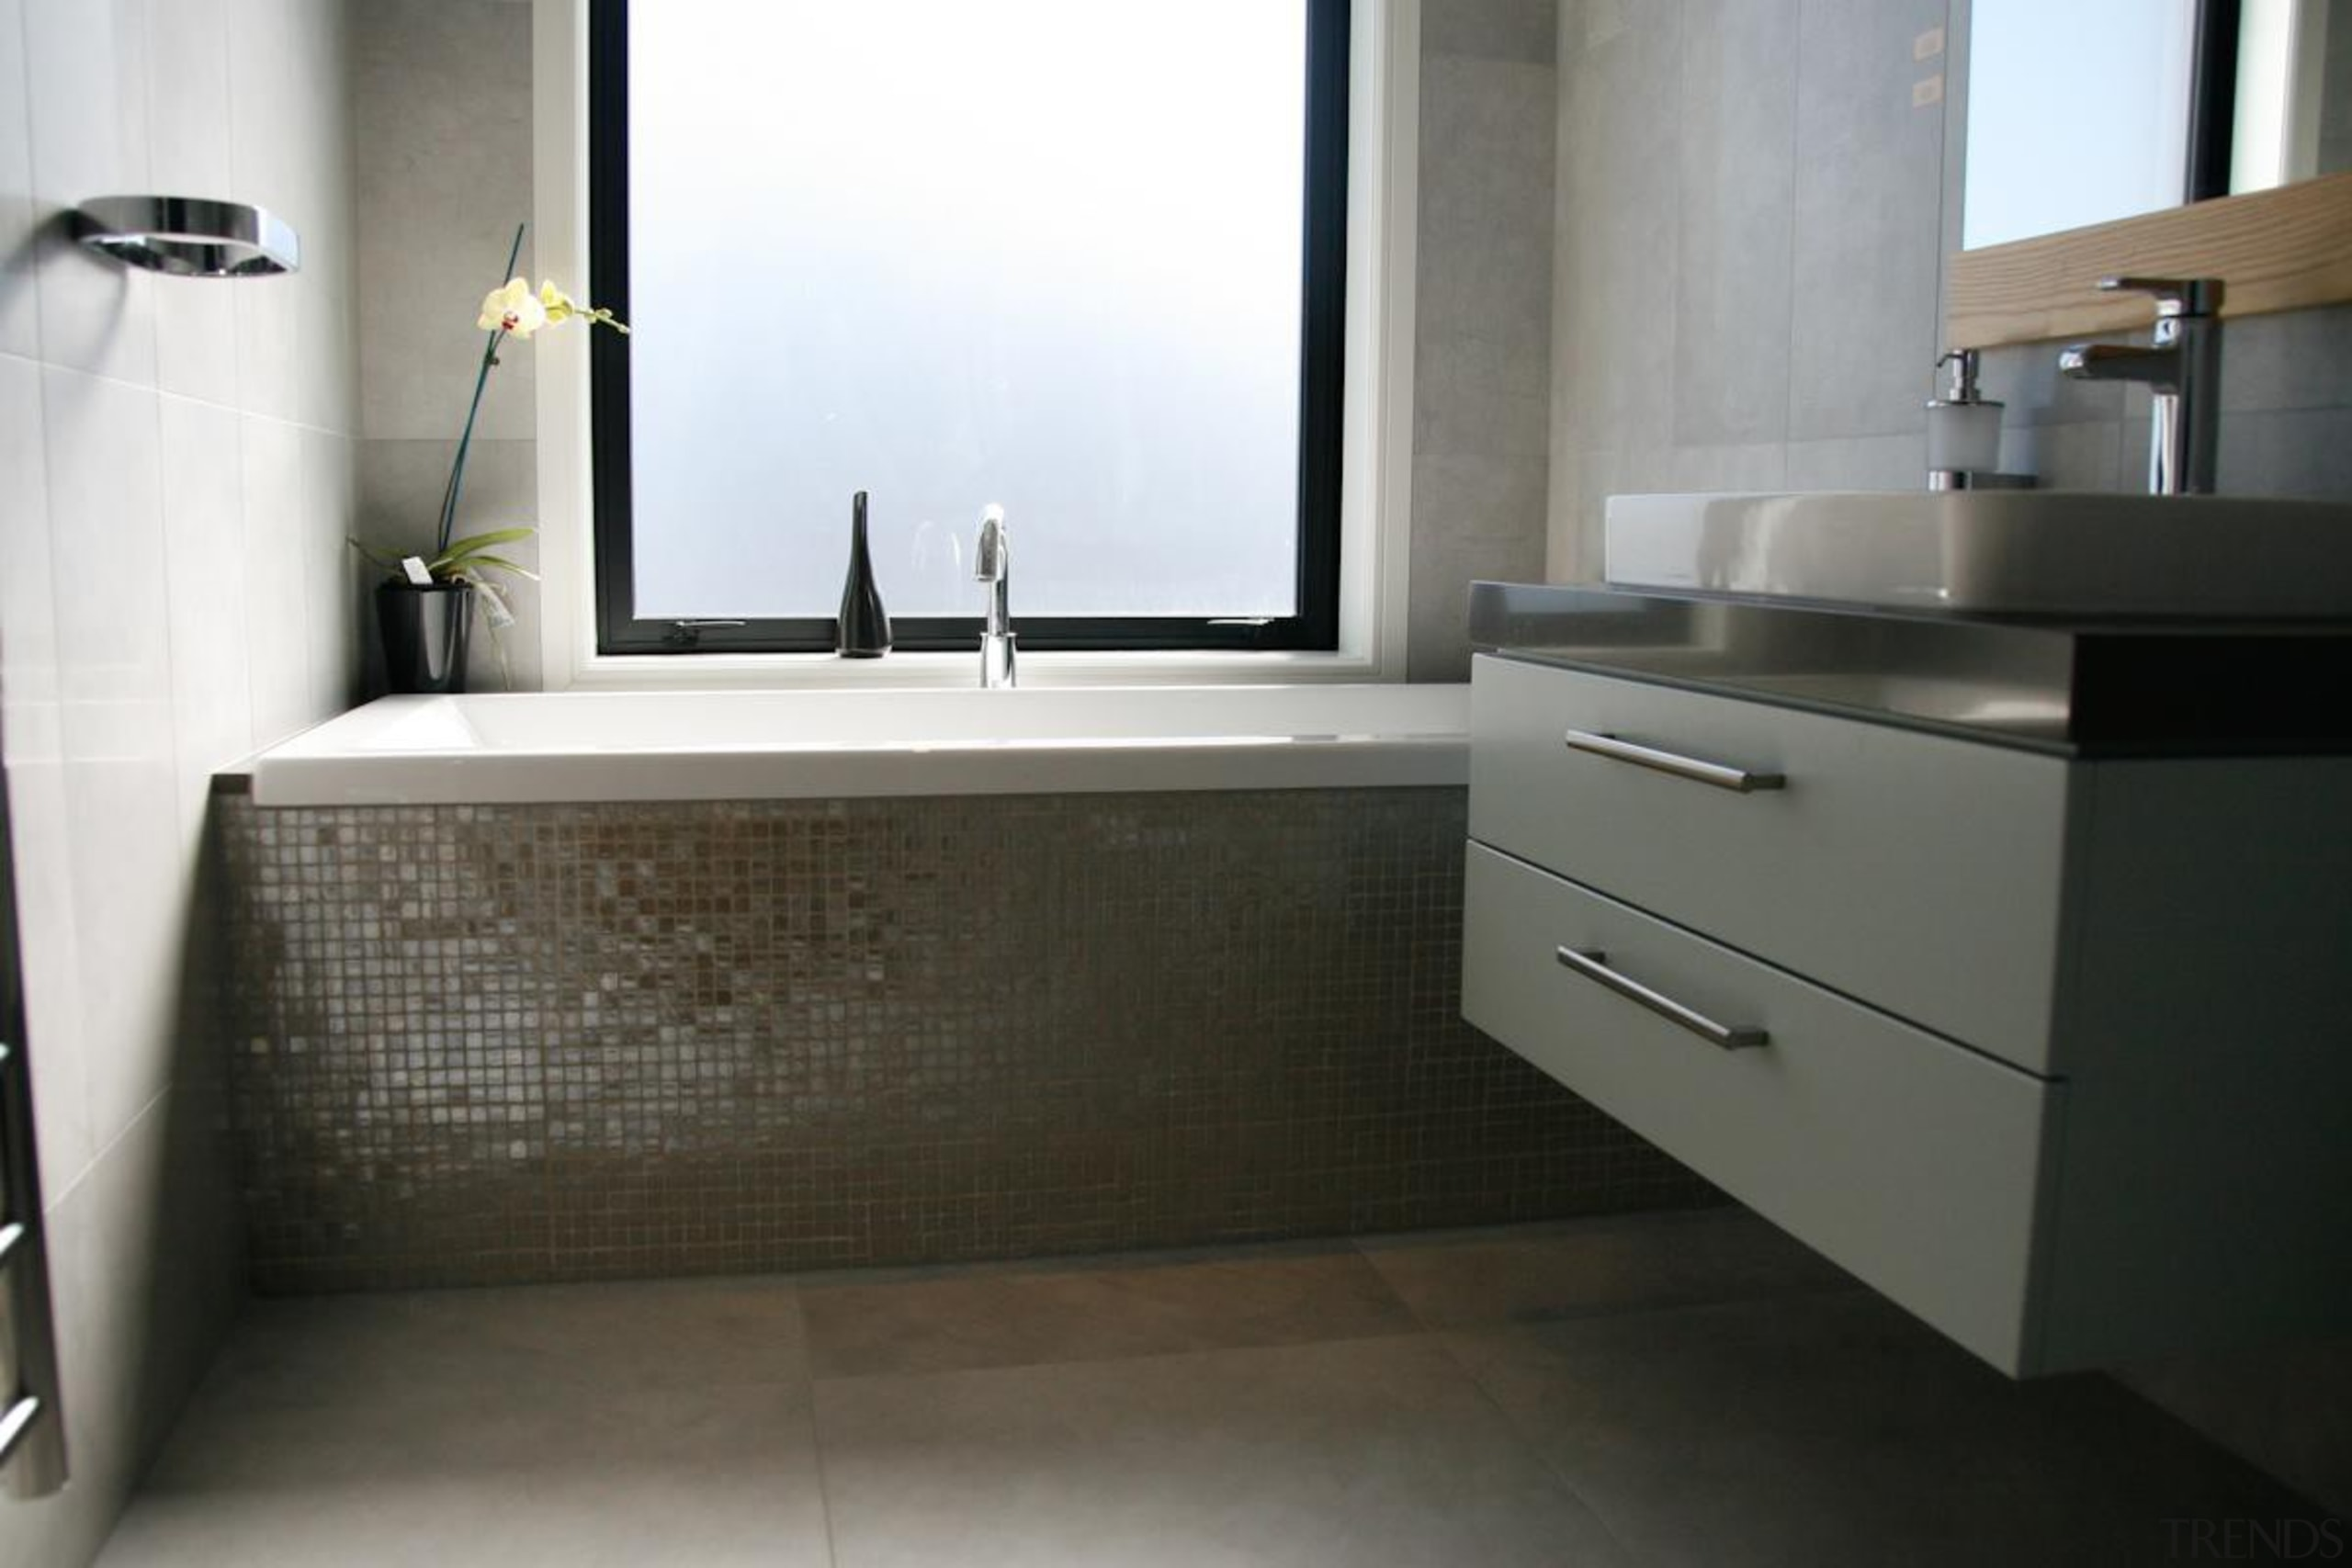 vetro silver lux tiled bath and graffiti cenere bathroom, bathroom accessory, bathroom cabinet, countertop, floor, interior design, product design, room, sink, tap, black, gray, white